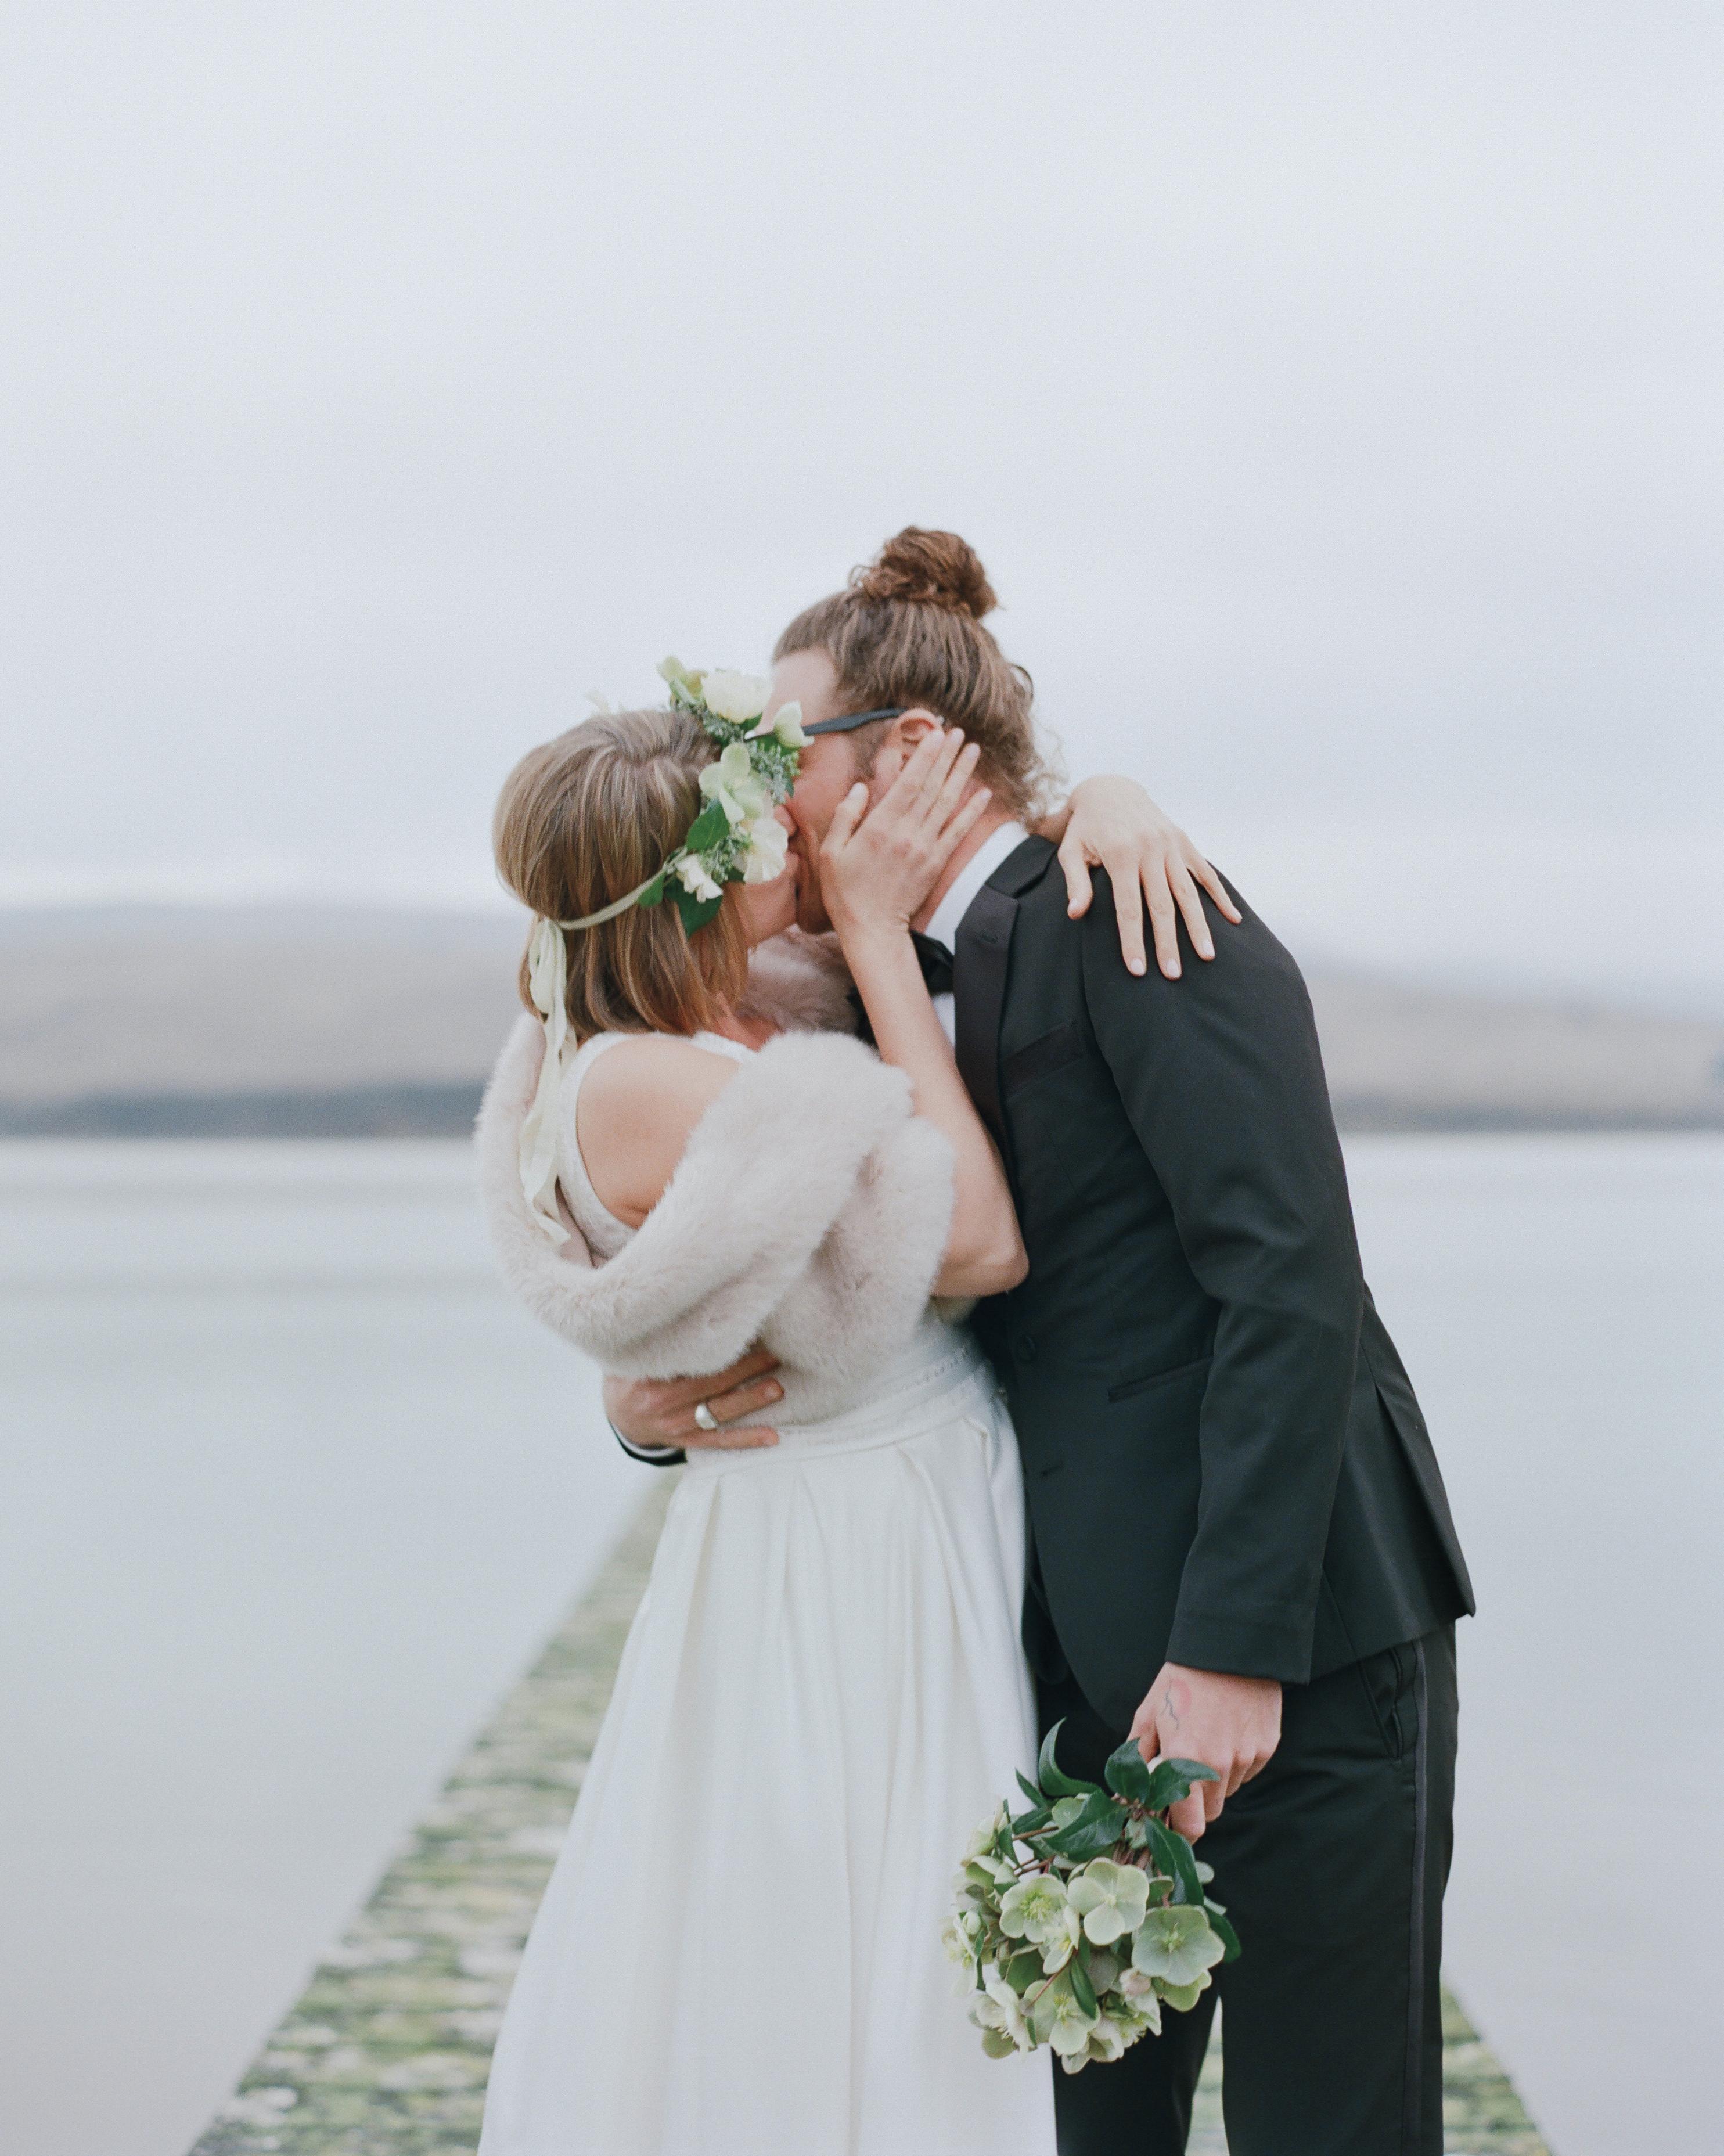 alison-markus-real-wedding-elizabeth-messina-275-ds111251.jpg